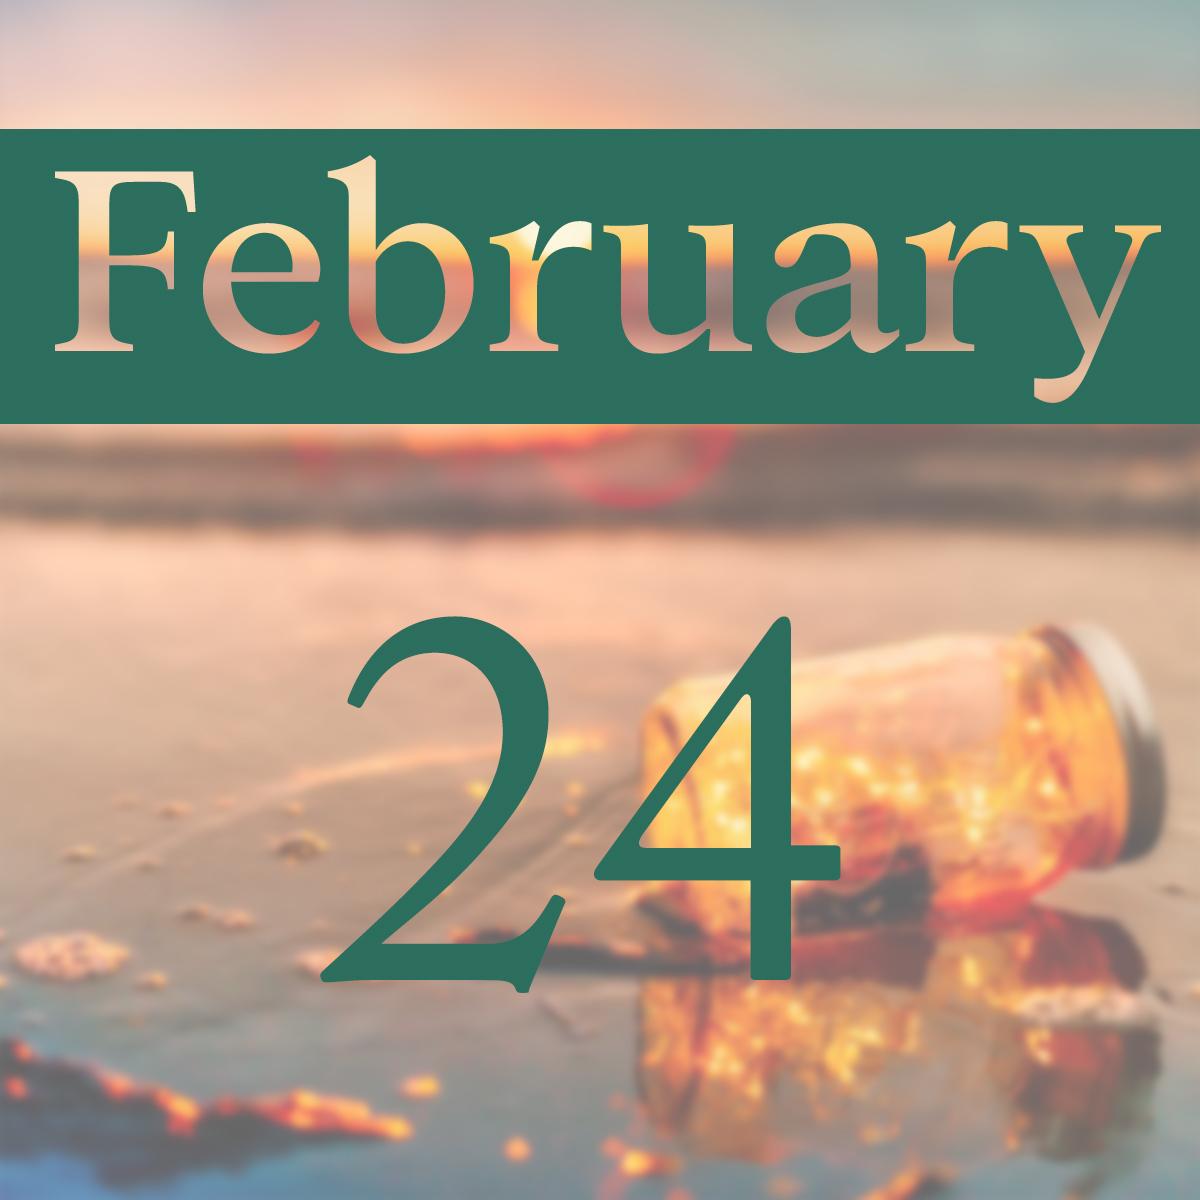 Monday, February 24th